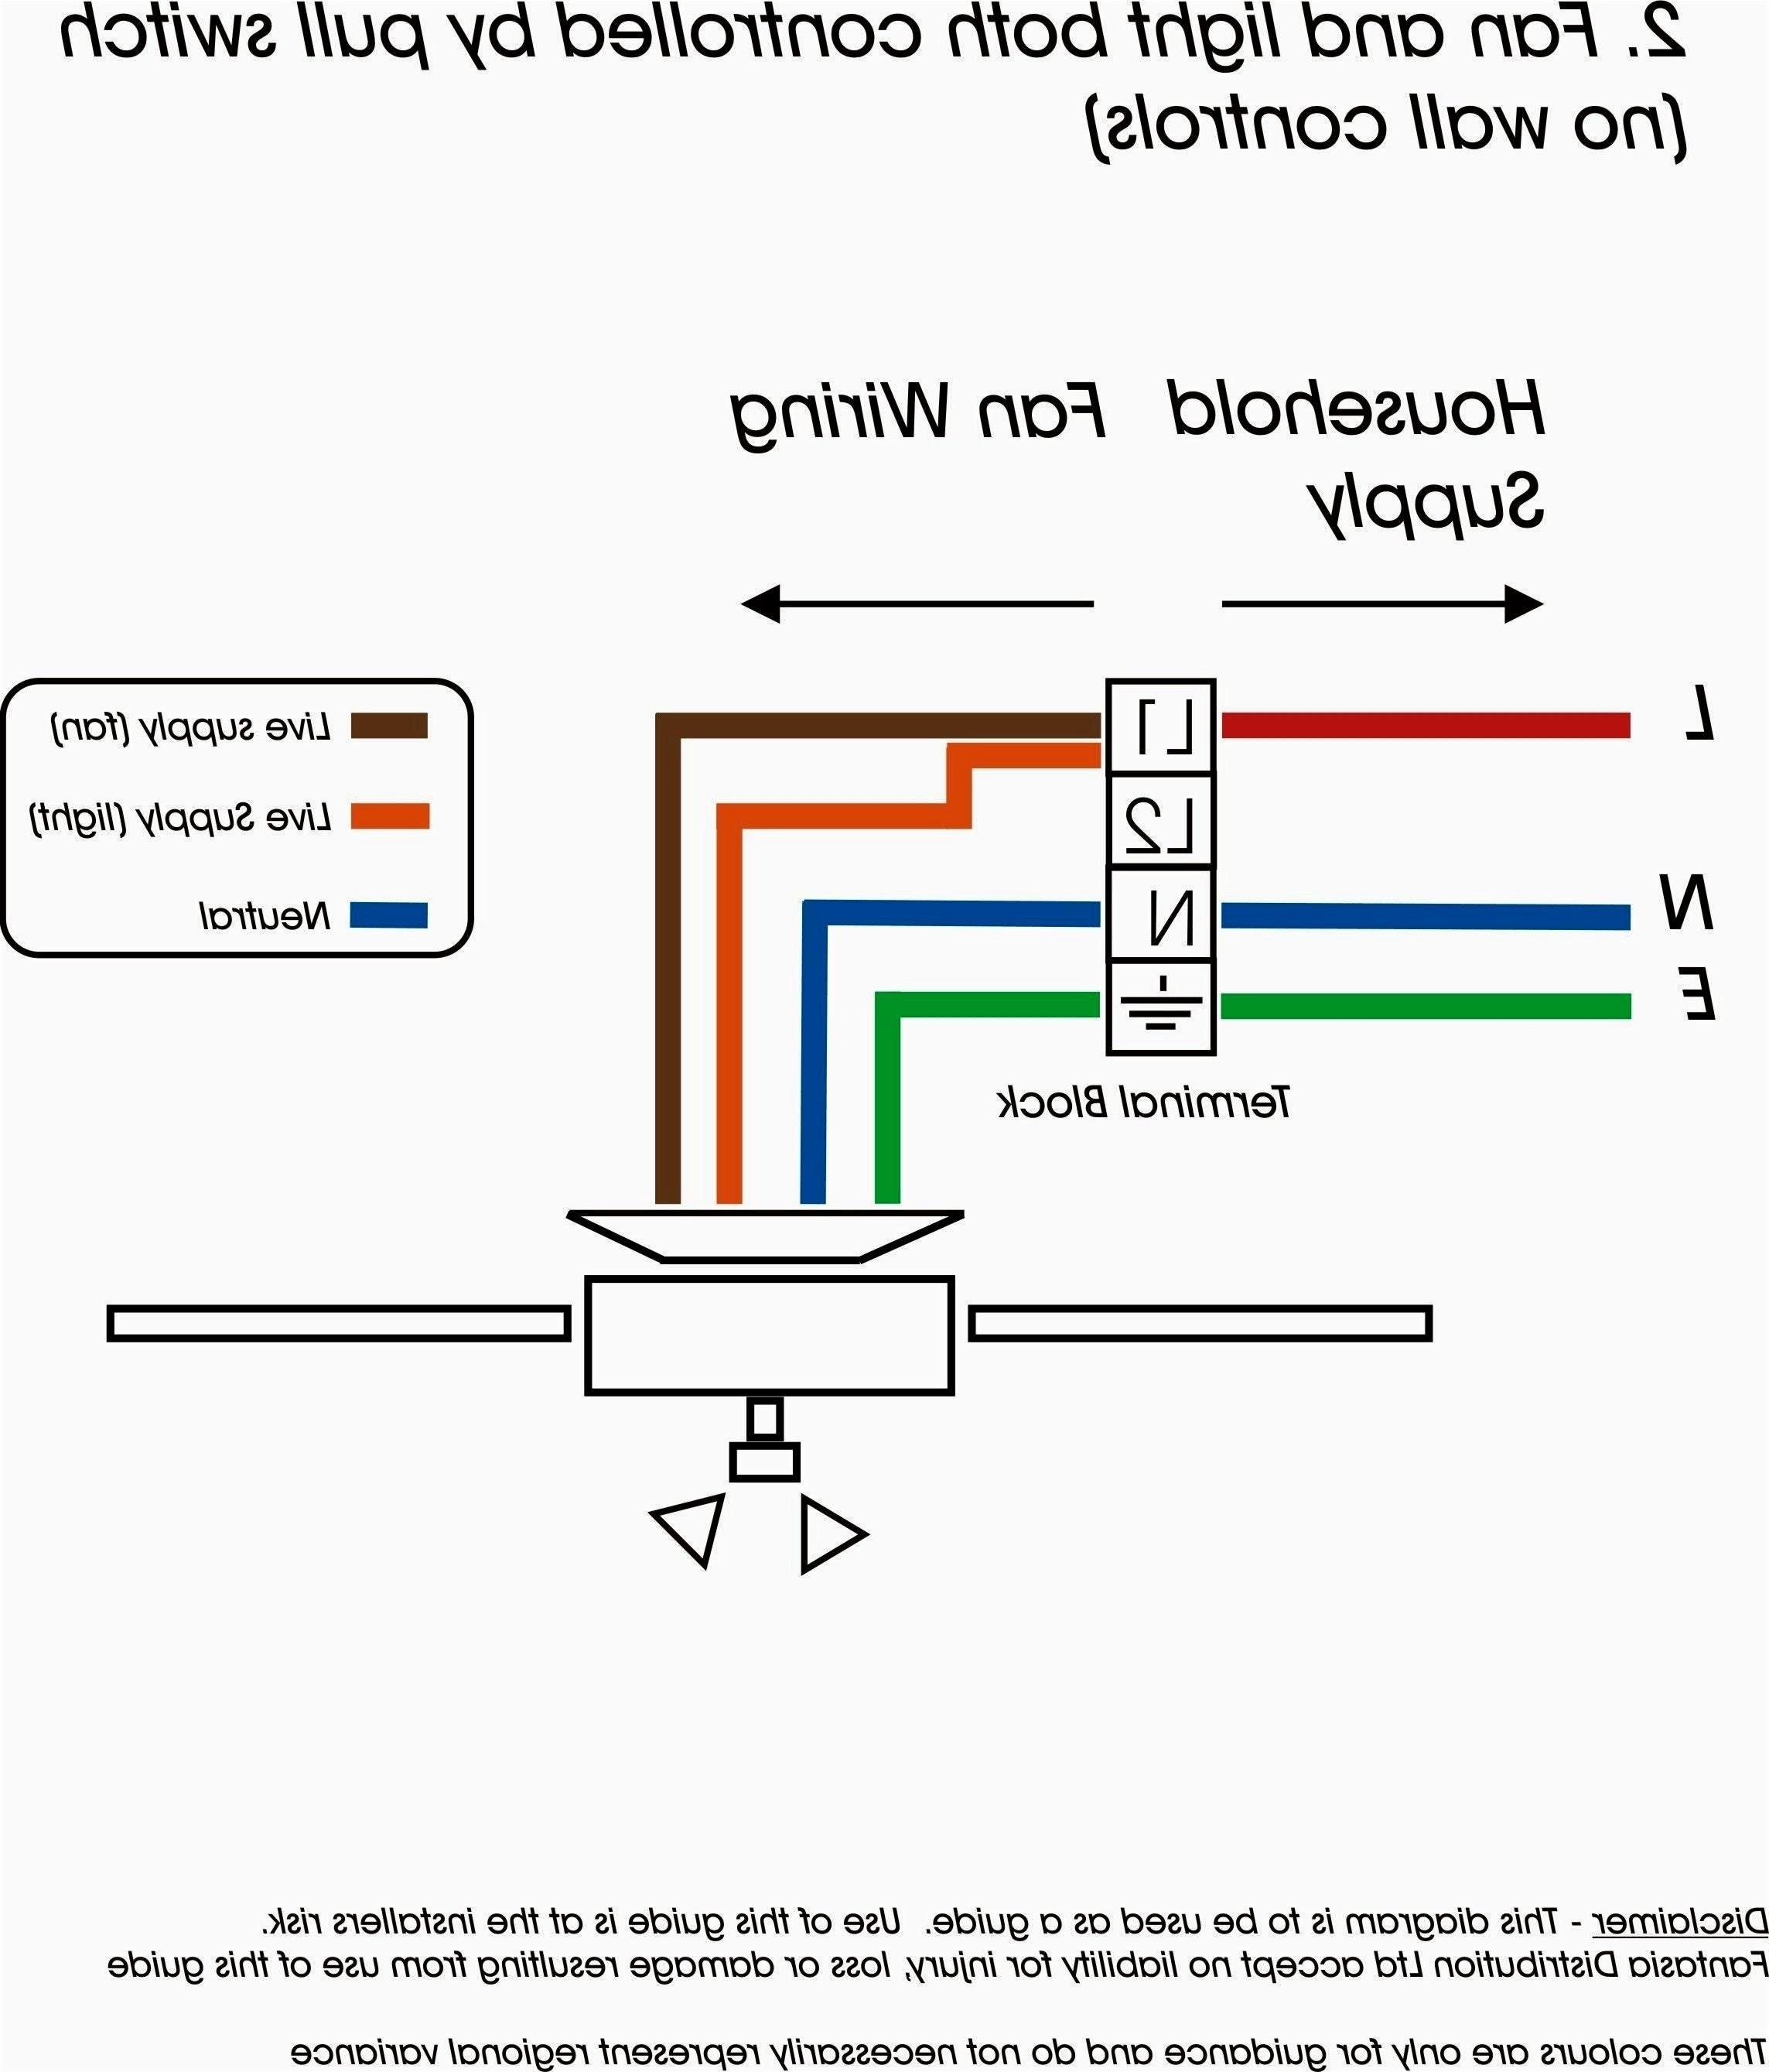 Delco Remy 3 Wire Alternator Wiring Diagram Simple Wiring Diagram - Delco Remy Alternator Wiring Diagram